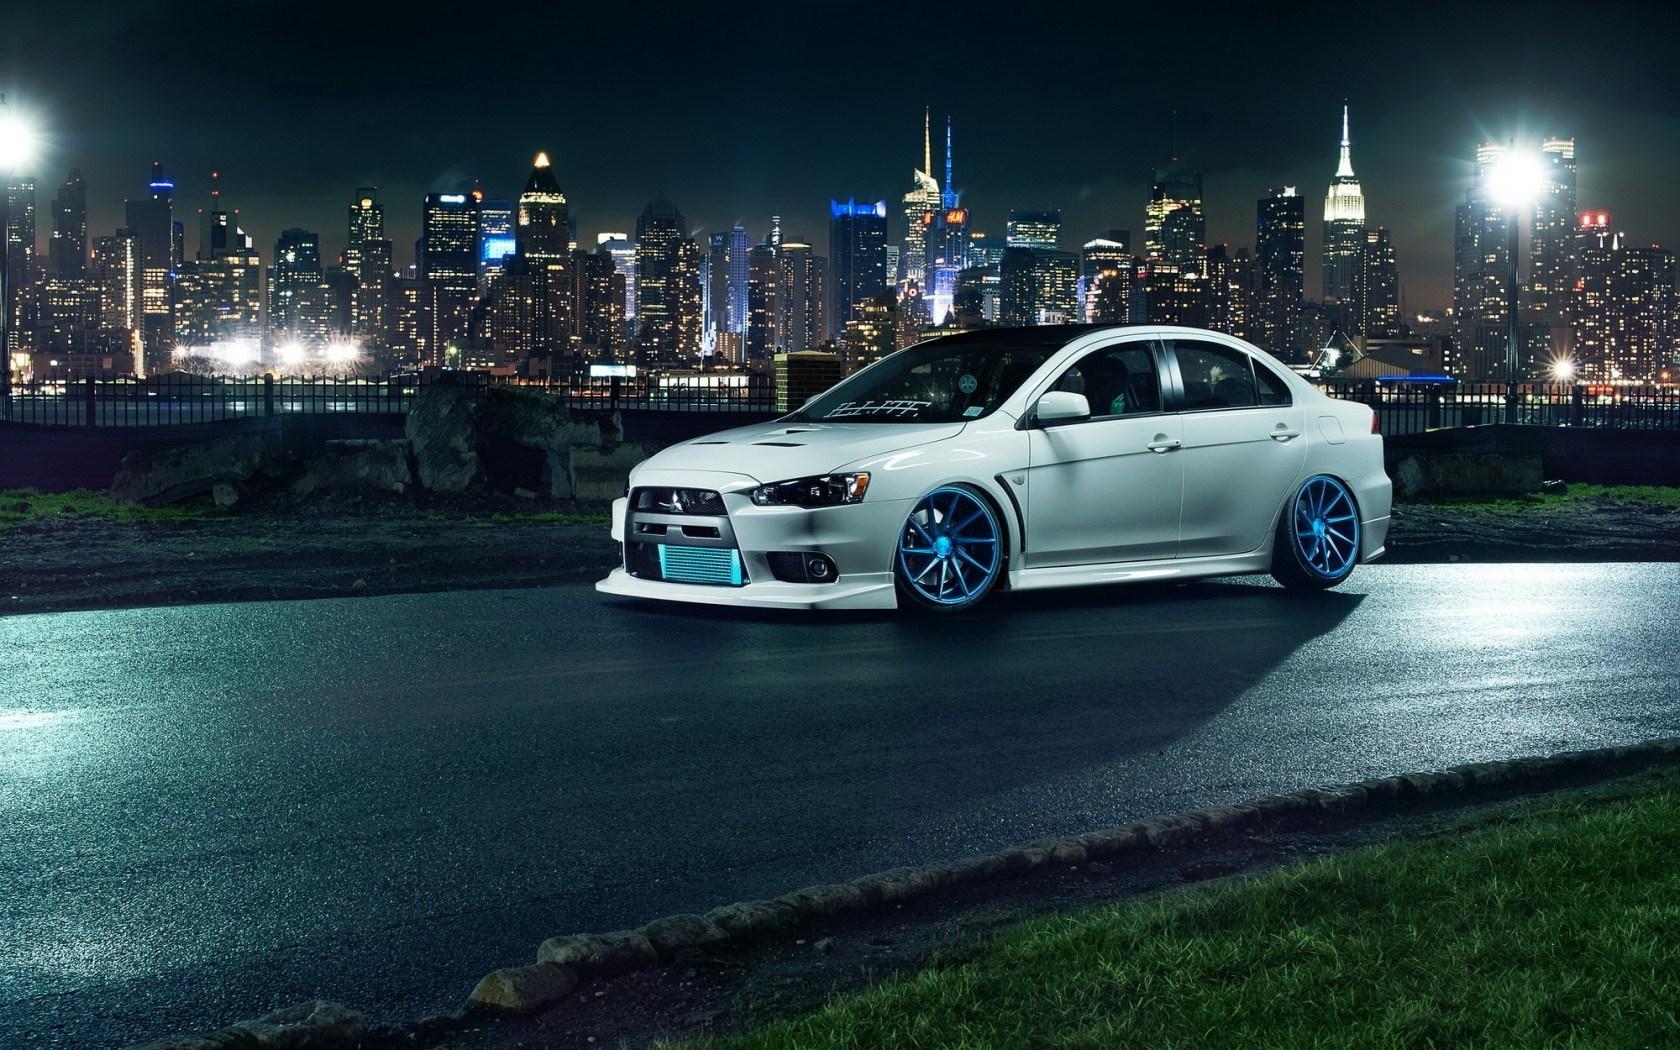 Background Car Hd Wallpapers Cities: Mitsubishi Evo X Wallpaper